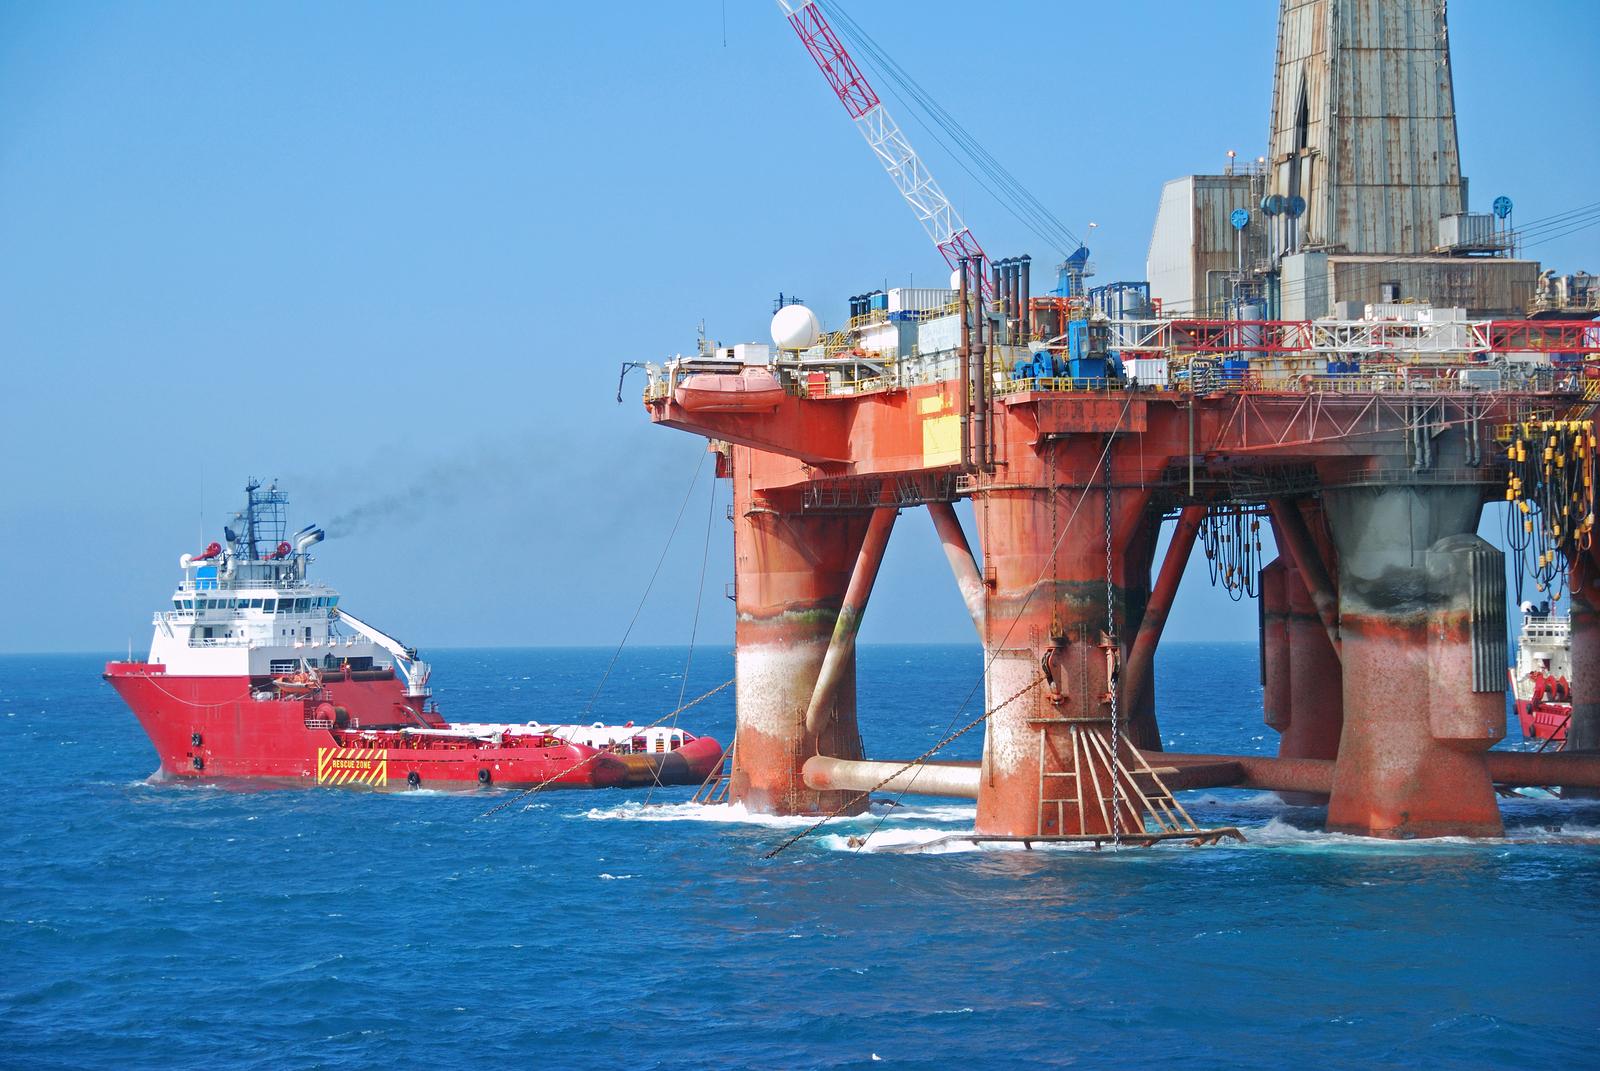 Maritime Injury Compensation